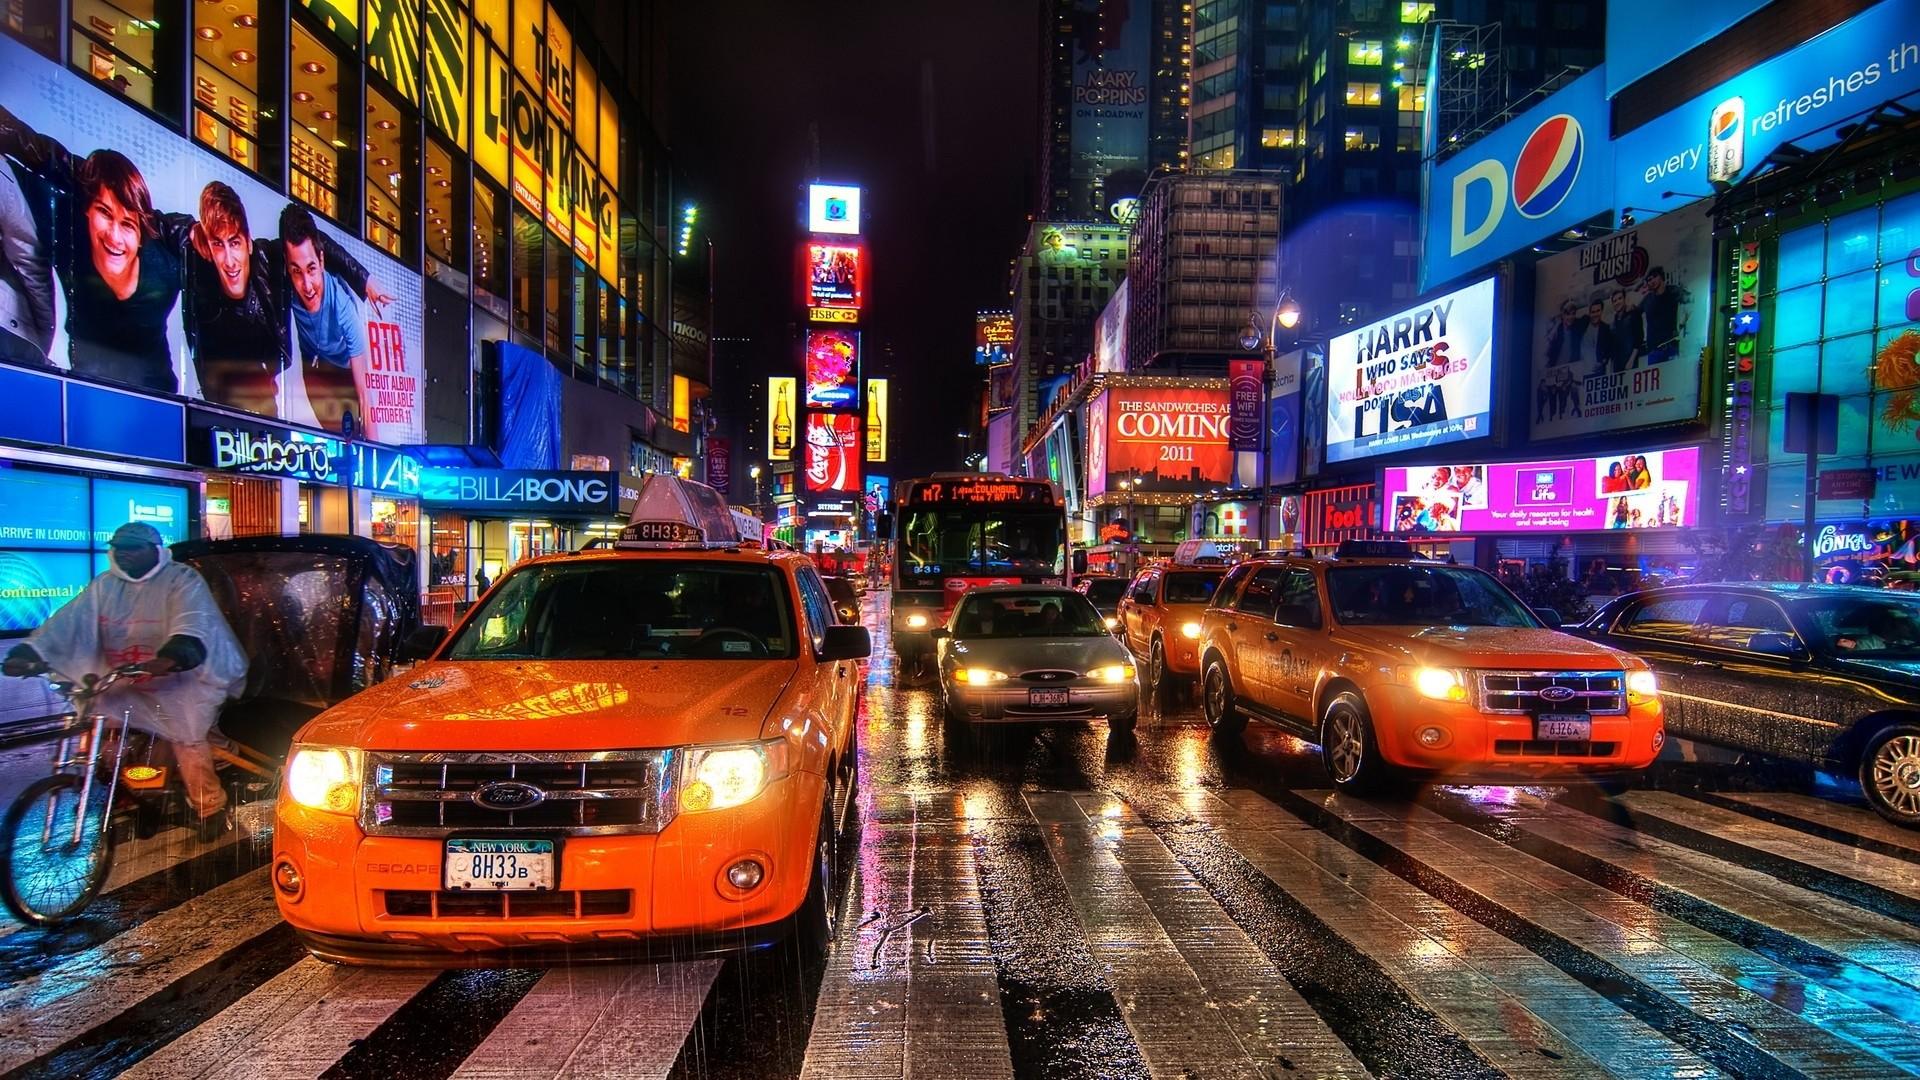 New York City At Night wallpaper 180738 1920x1080